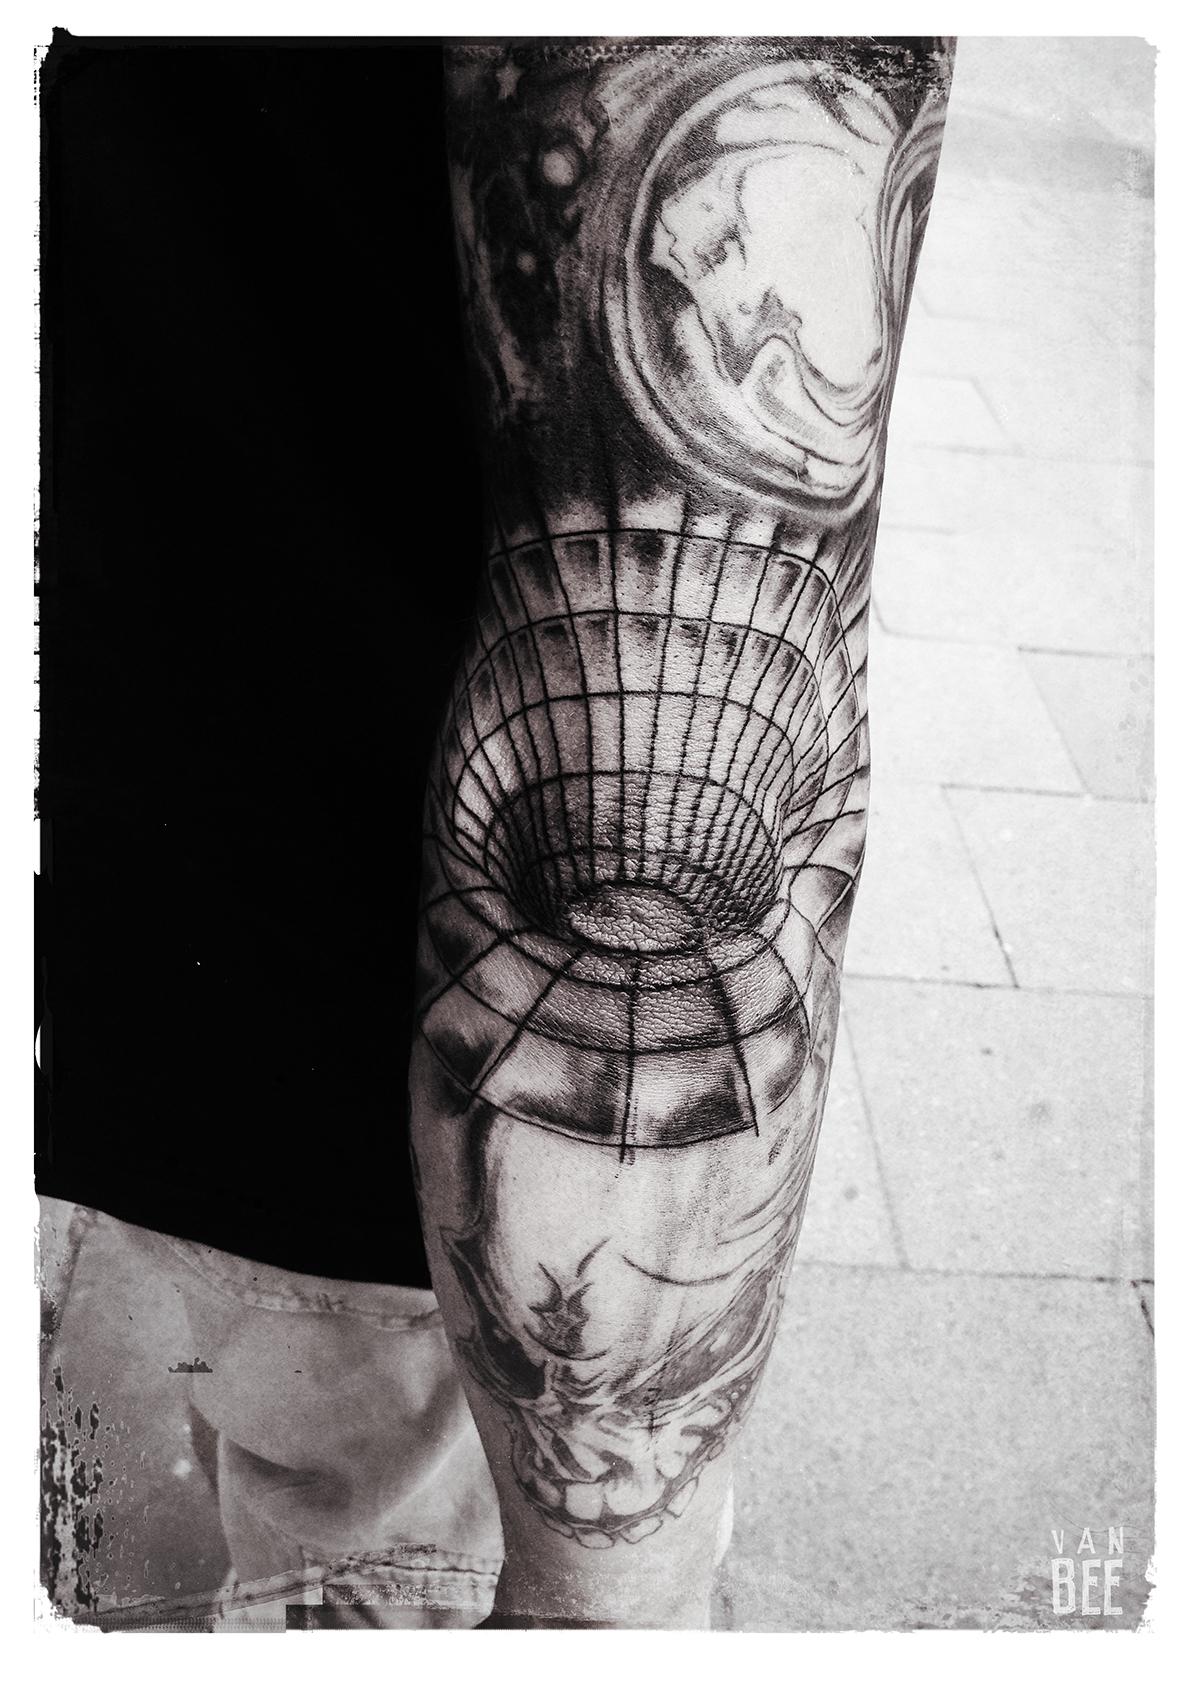 Van Bee, tattoo artist - the vandallist (8)